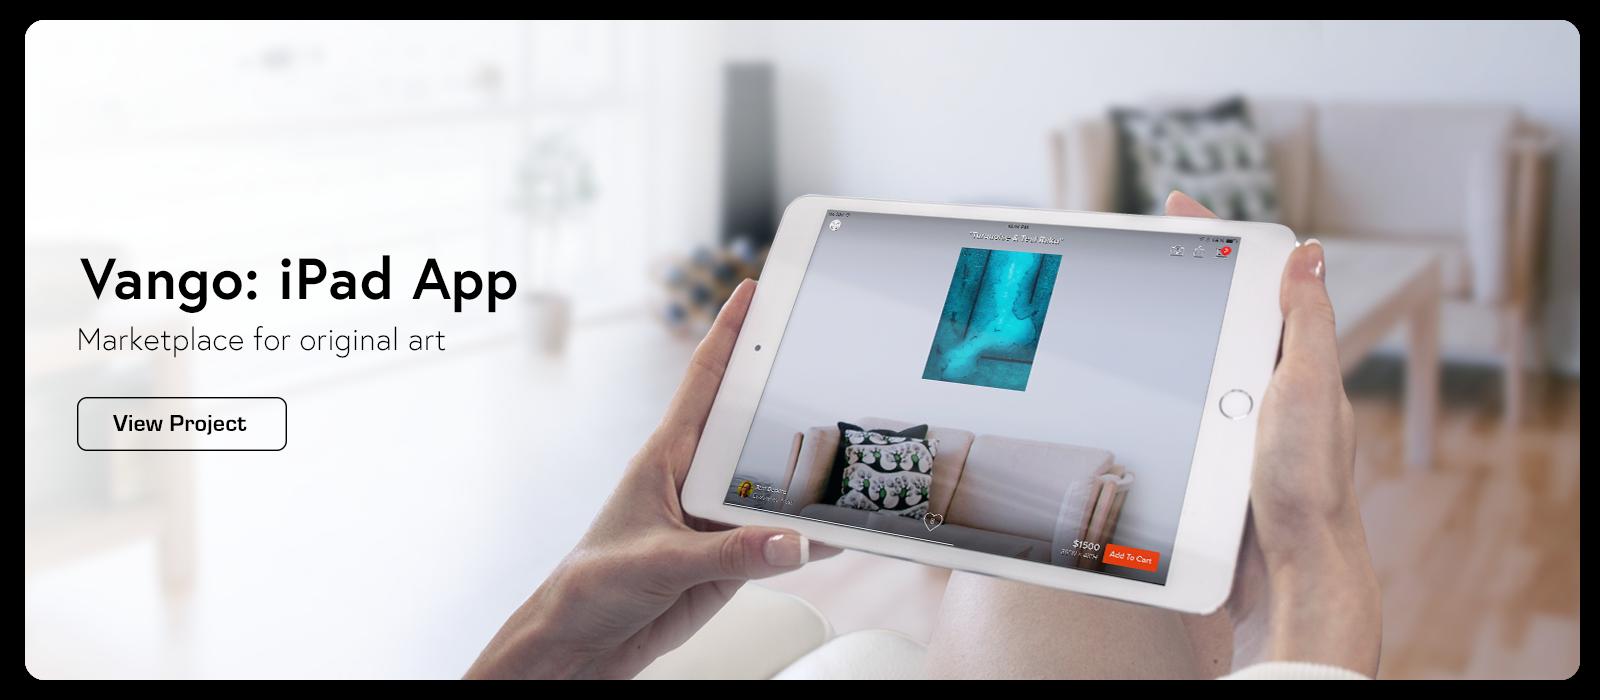 ipad-app-large.png